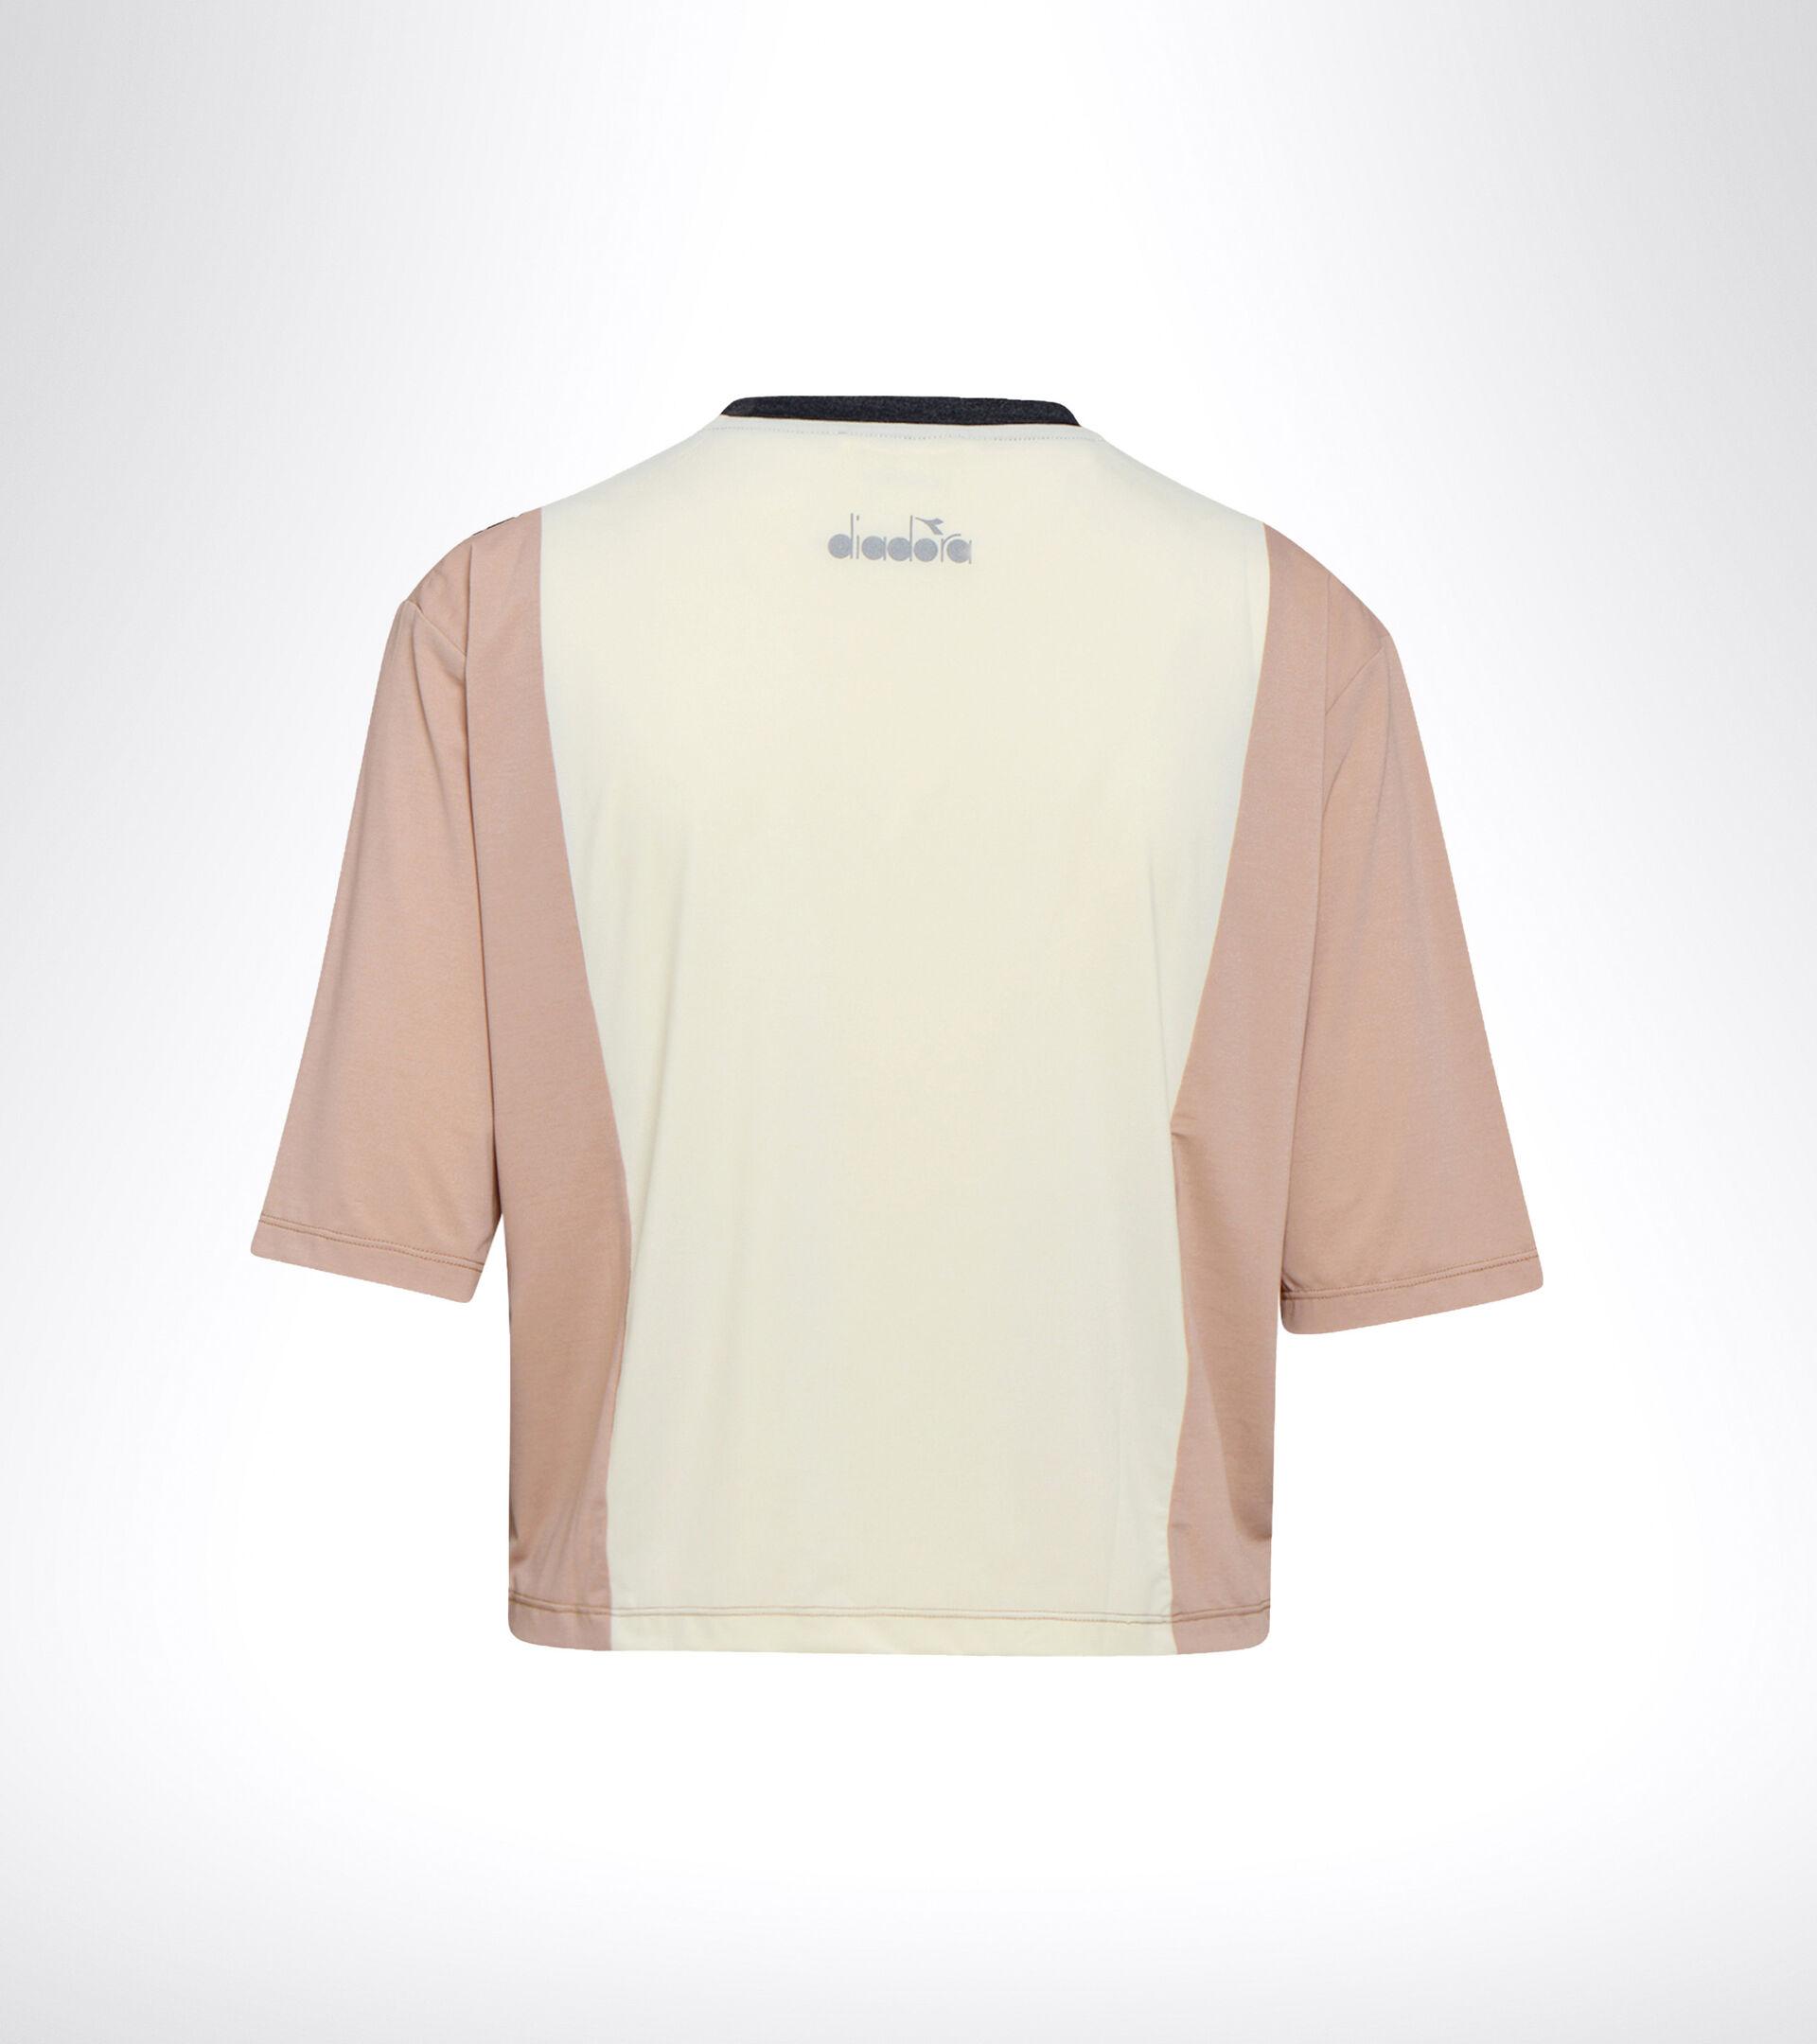 Camiseta para correr - Mujer L. SS T-SHIRT BE ONE TECH ROSA CAOBA/BLANCO MURMURAR - Diadora